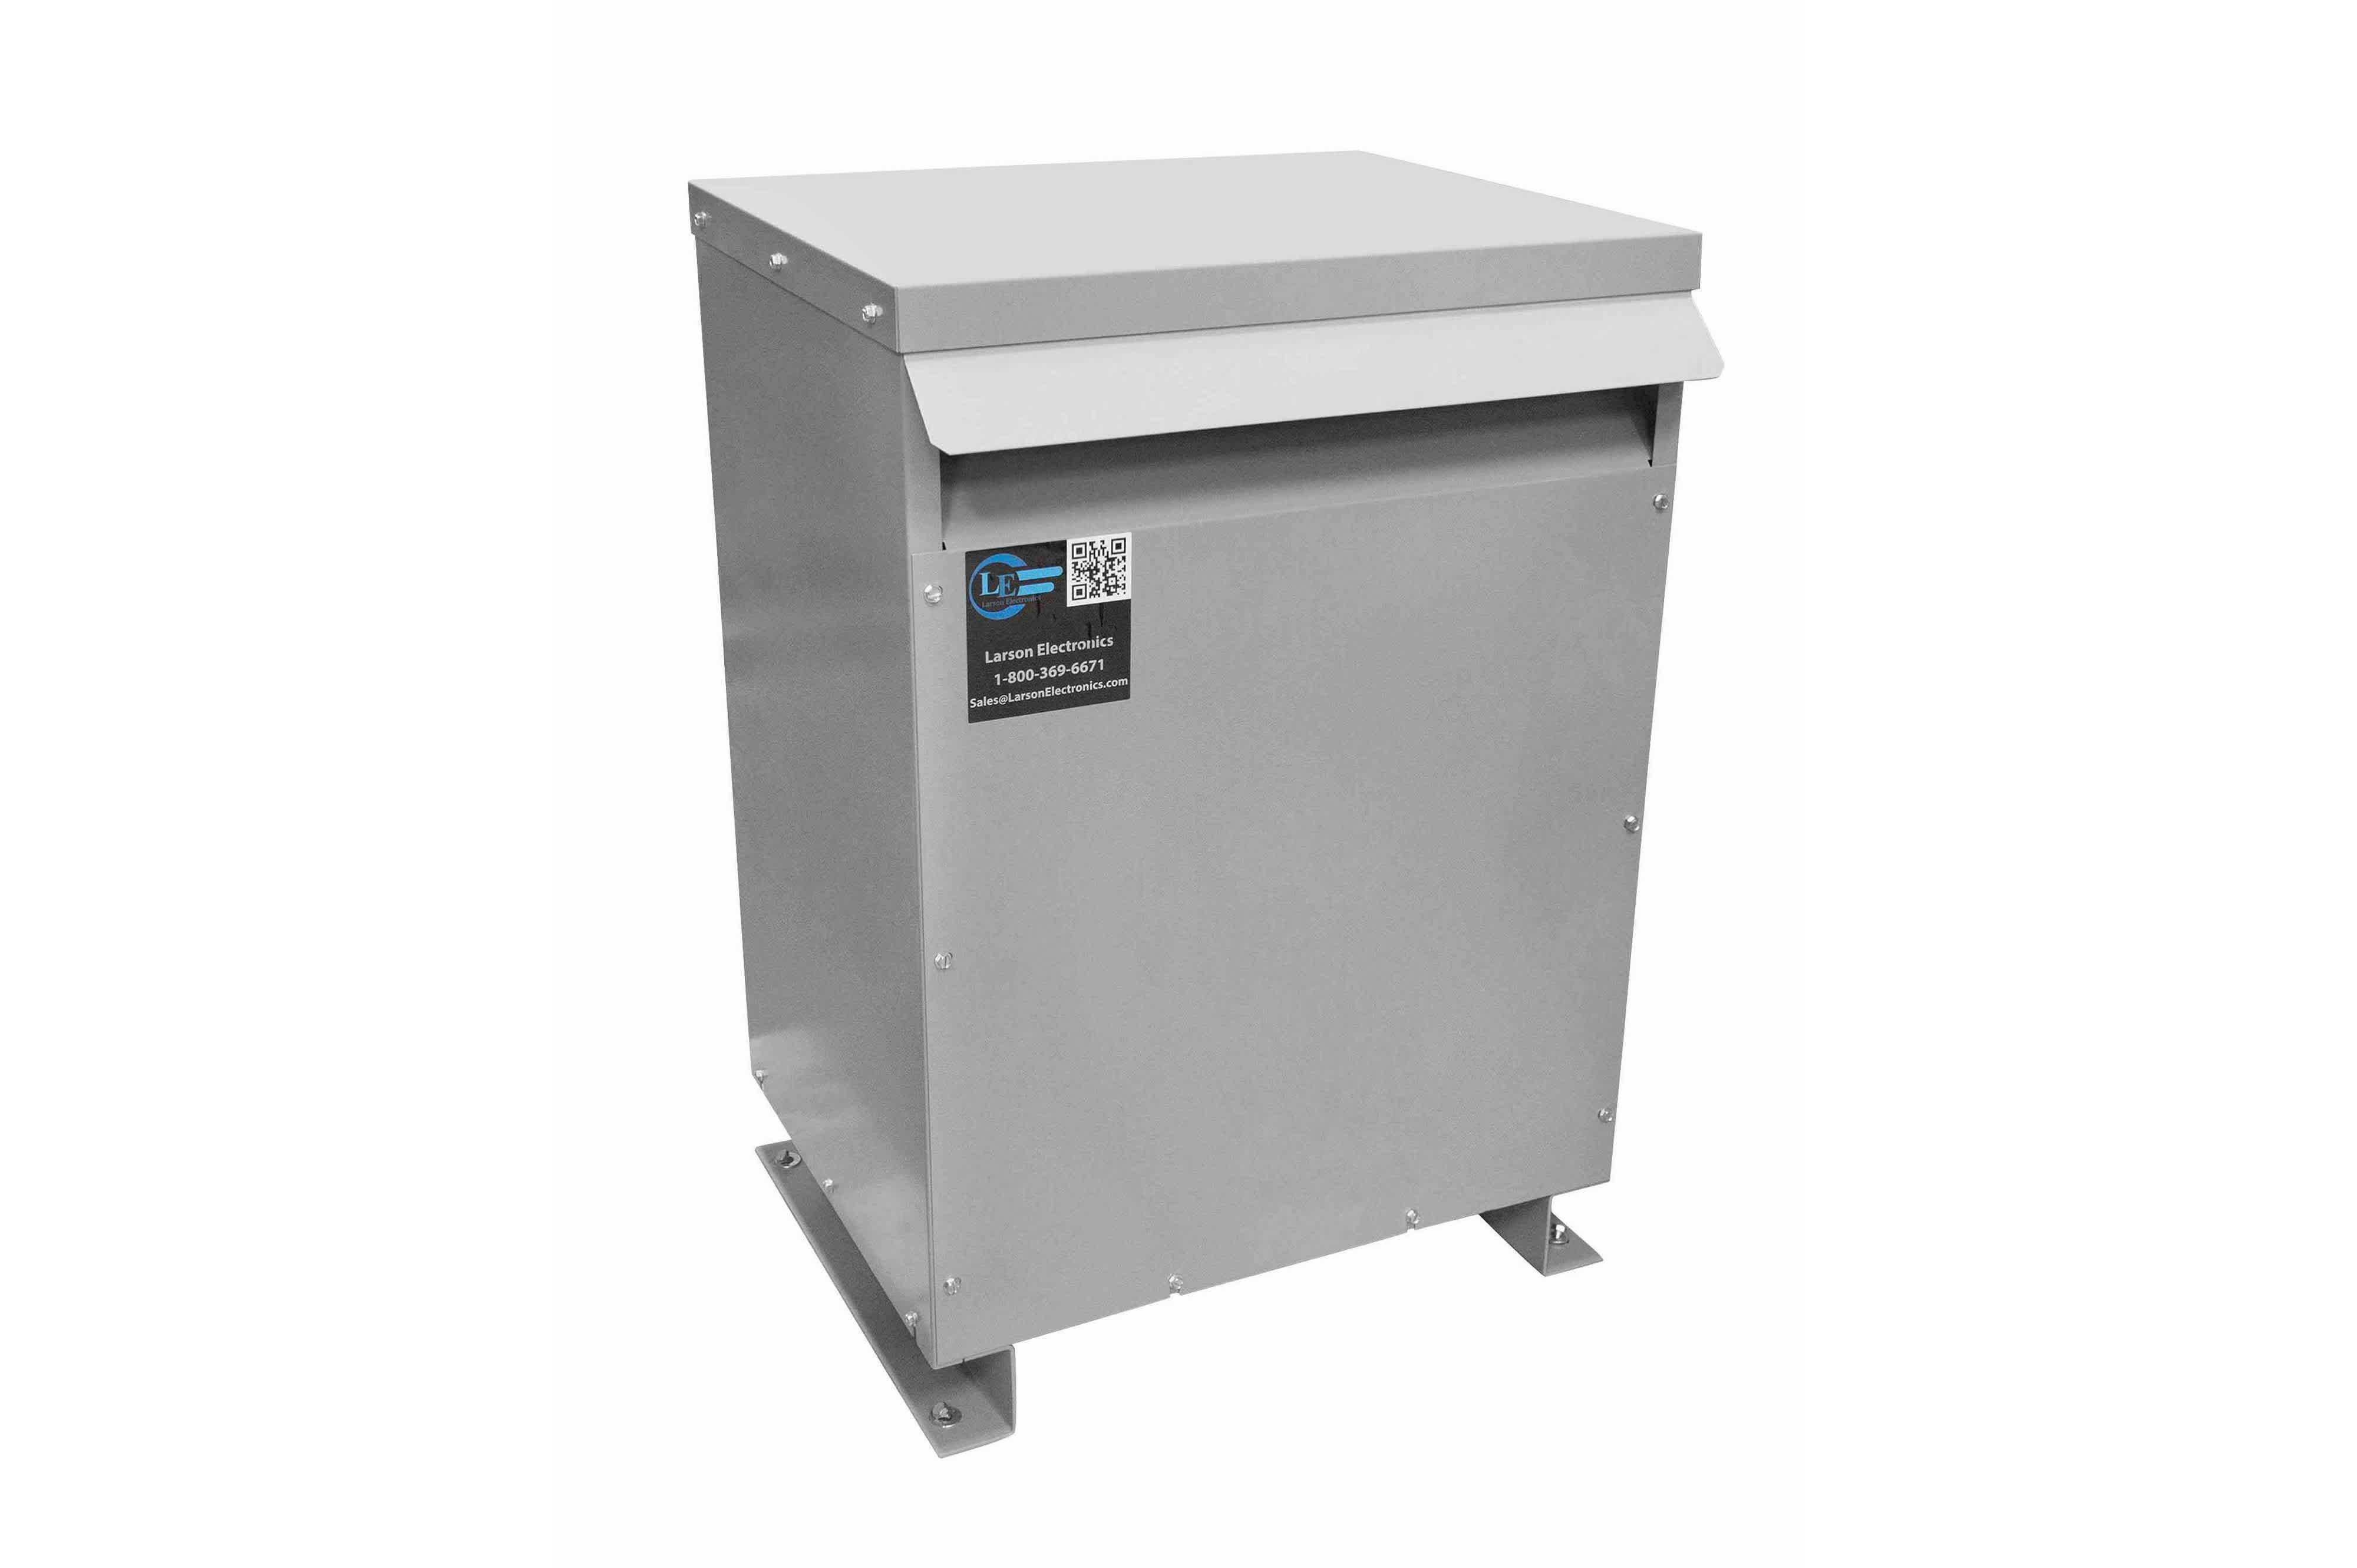 167 kVA 3PH Isolation Transformer, 575V Wye Primary, 208Y/120 Wye-N Secondary, N3R, Ventilated, 60 Hz